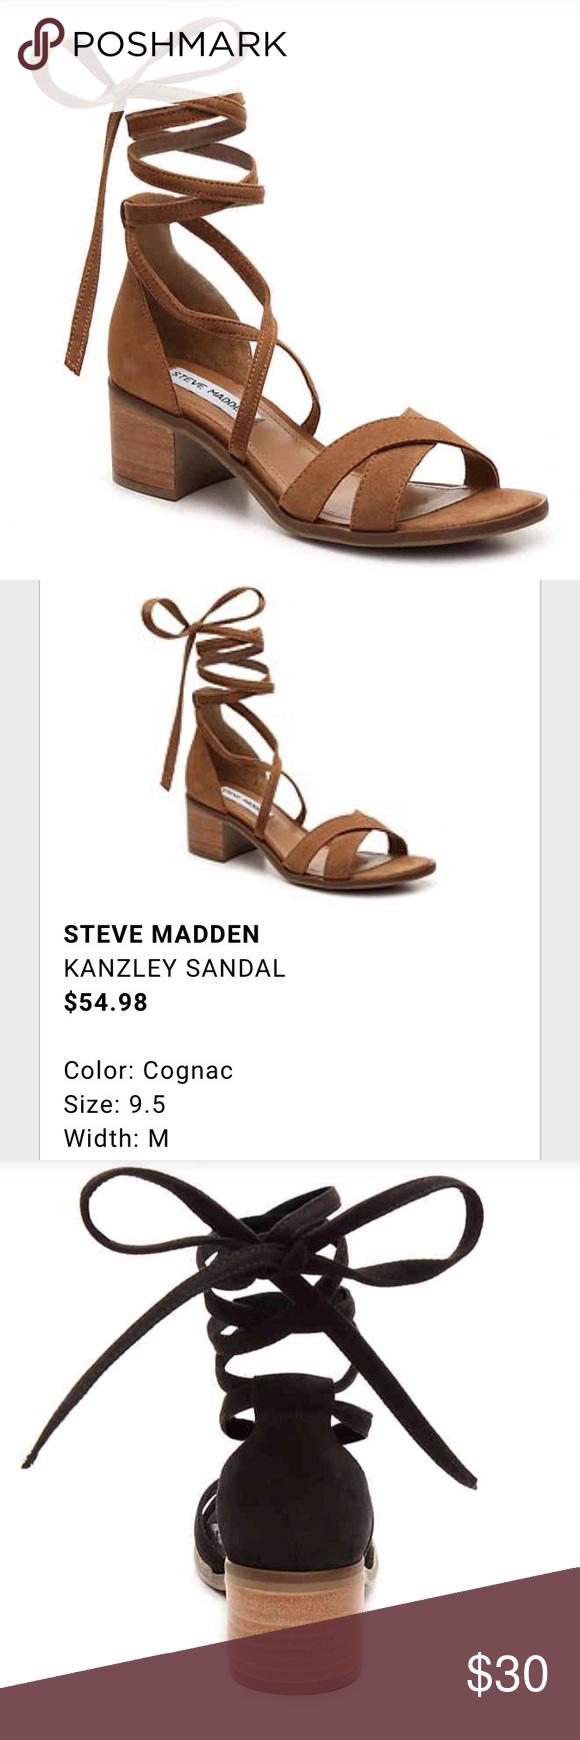 efc0f56dcd7 Steve Madden kanzley sandal low heel tie up cognac Steve Madden kanzley  sandal in cognac